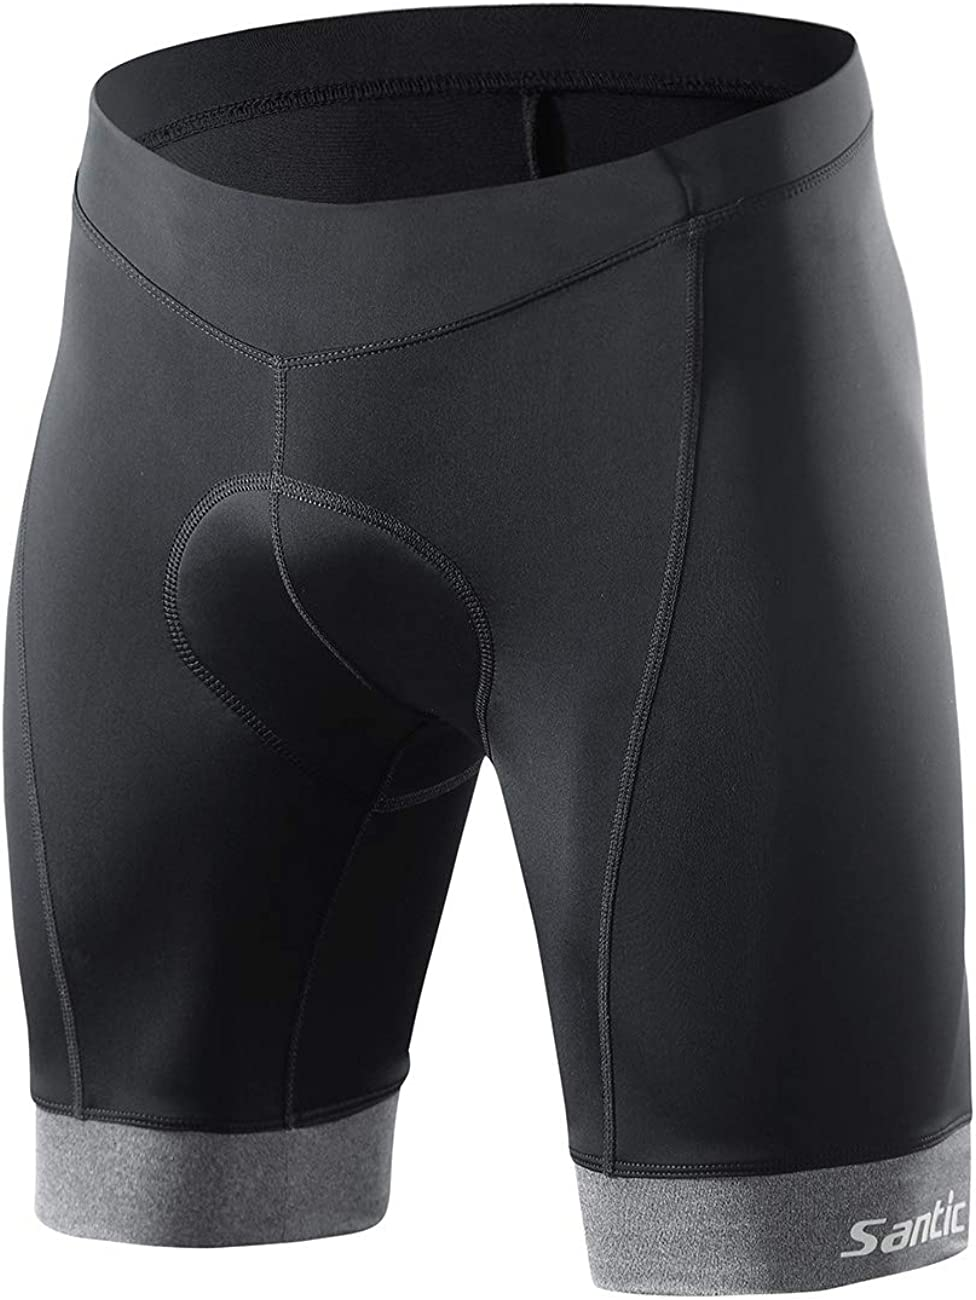 Santic Biking Shorts Men Cycling Shorts Padded Bike Shorts Quick Dry Bicycle Wear US X-Large